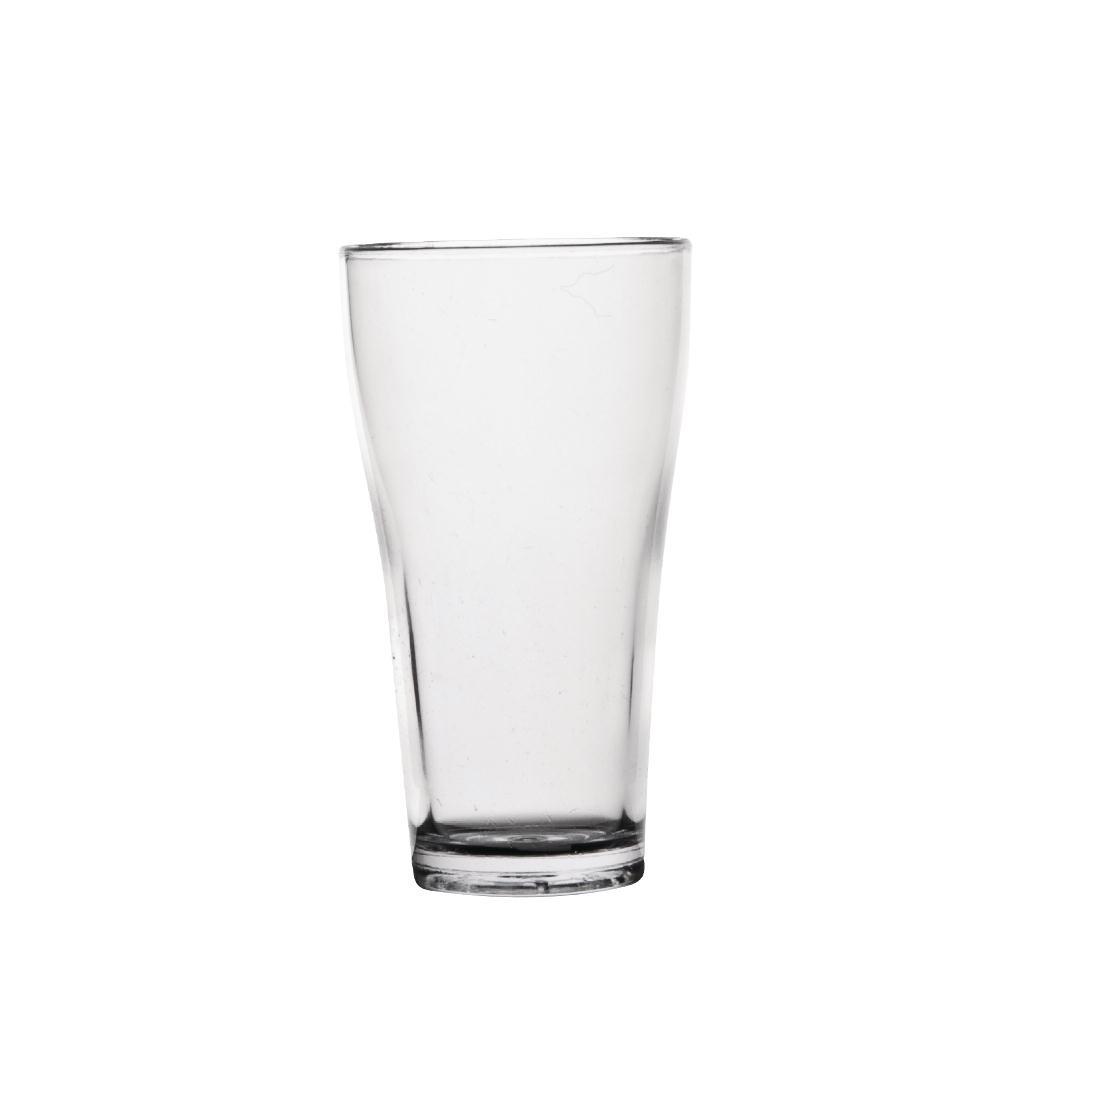 polycarbonate 285ml beer glass shatterproof